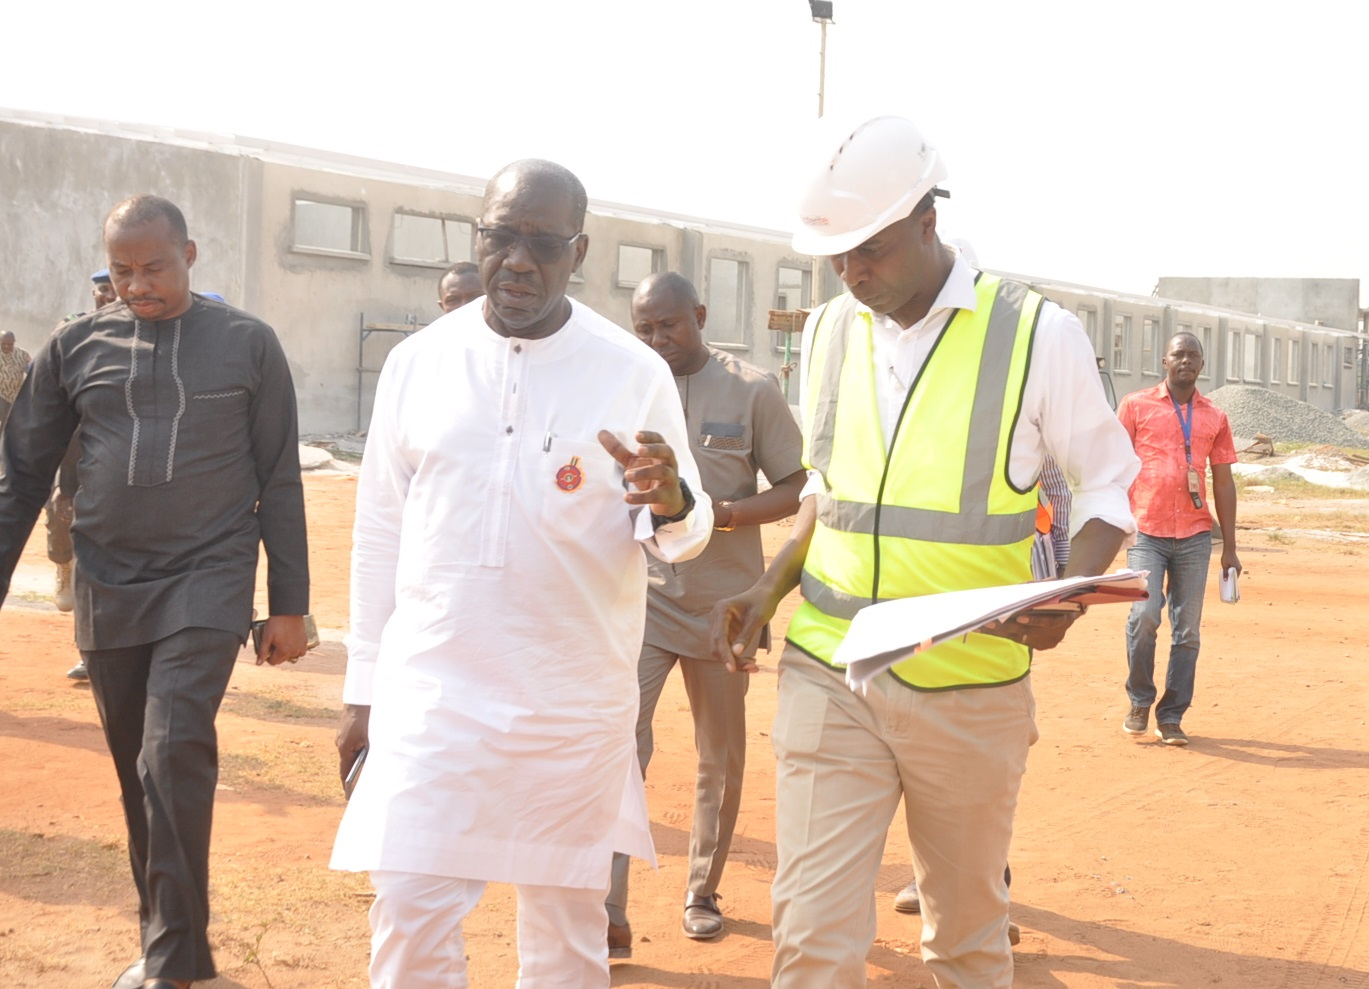 Benin Technical College revamp: Obaseki assures new workshop equipment will be ready in 90 days